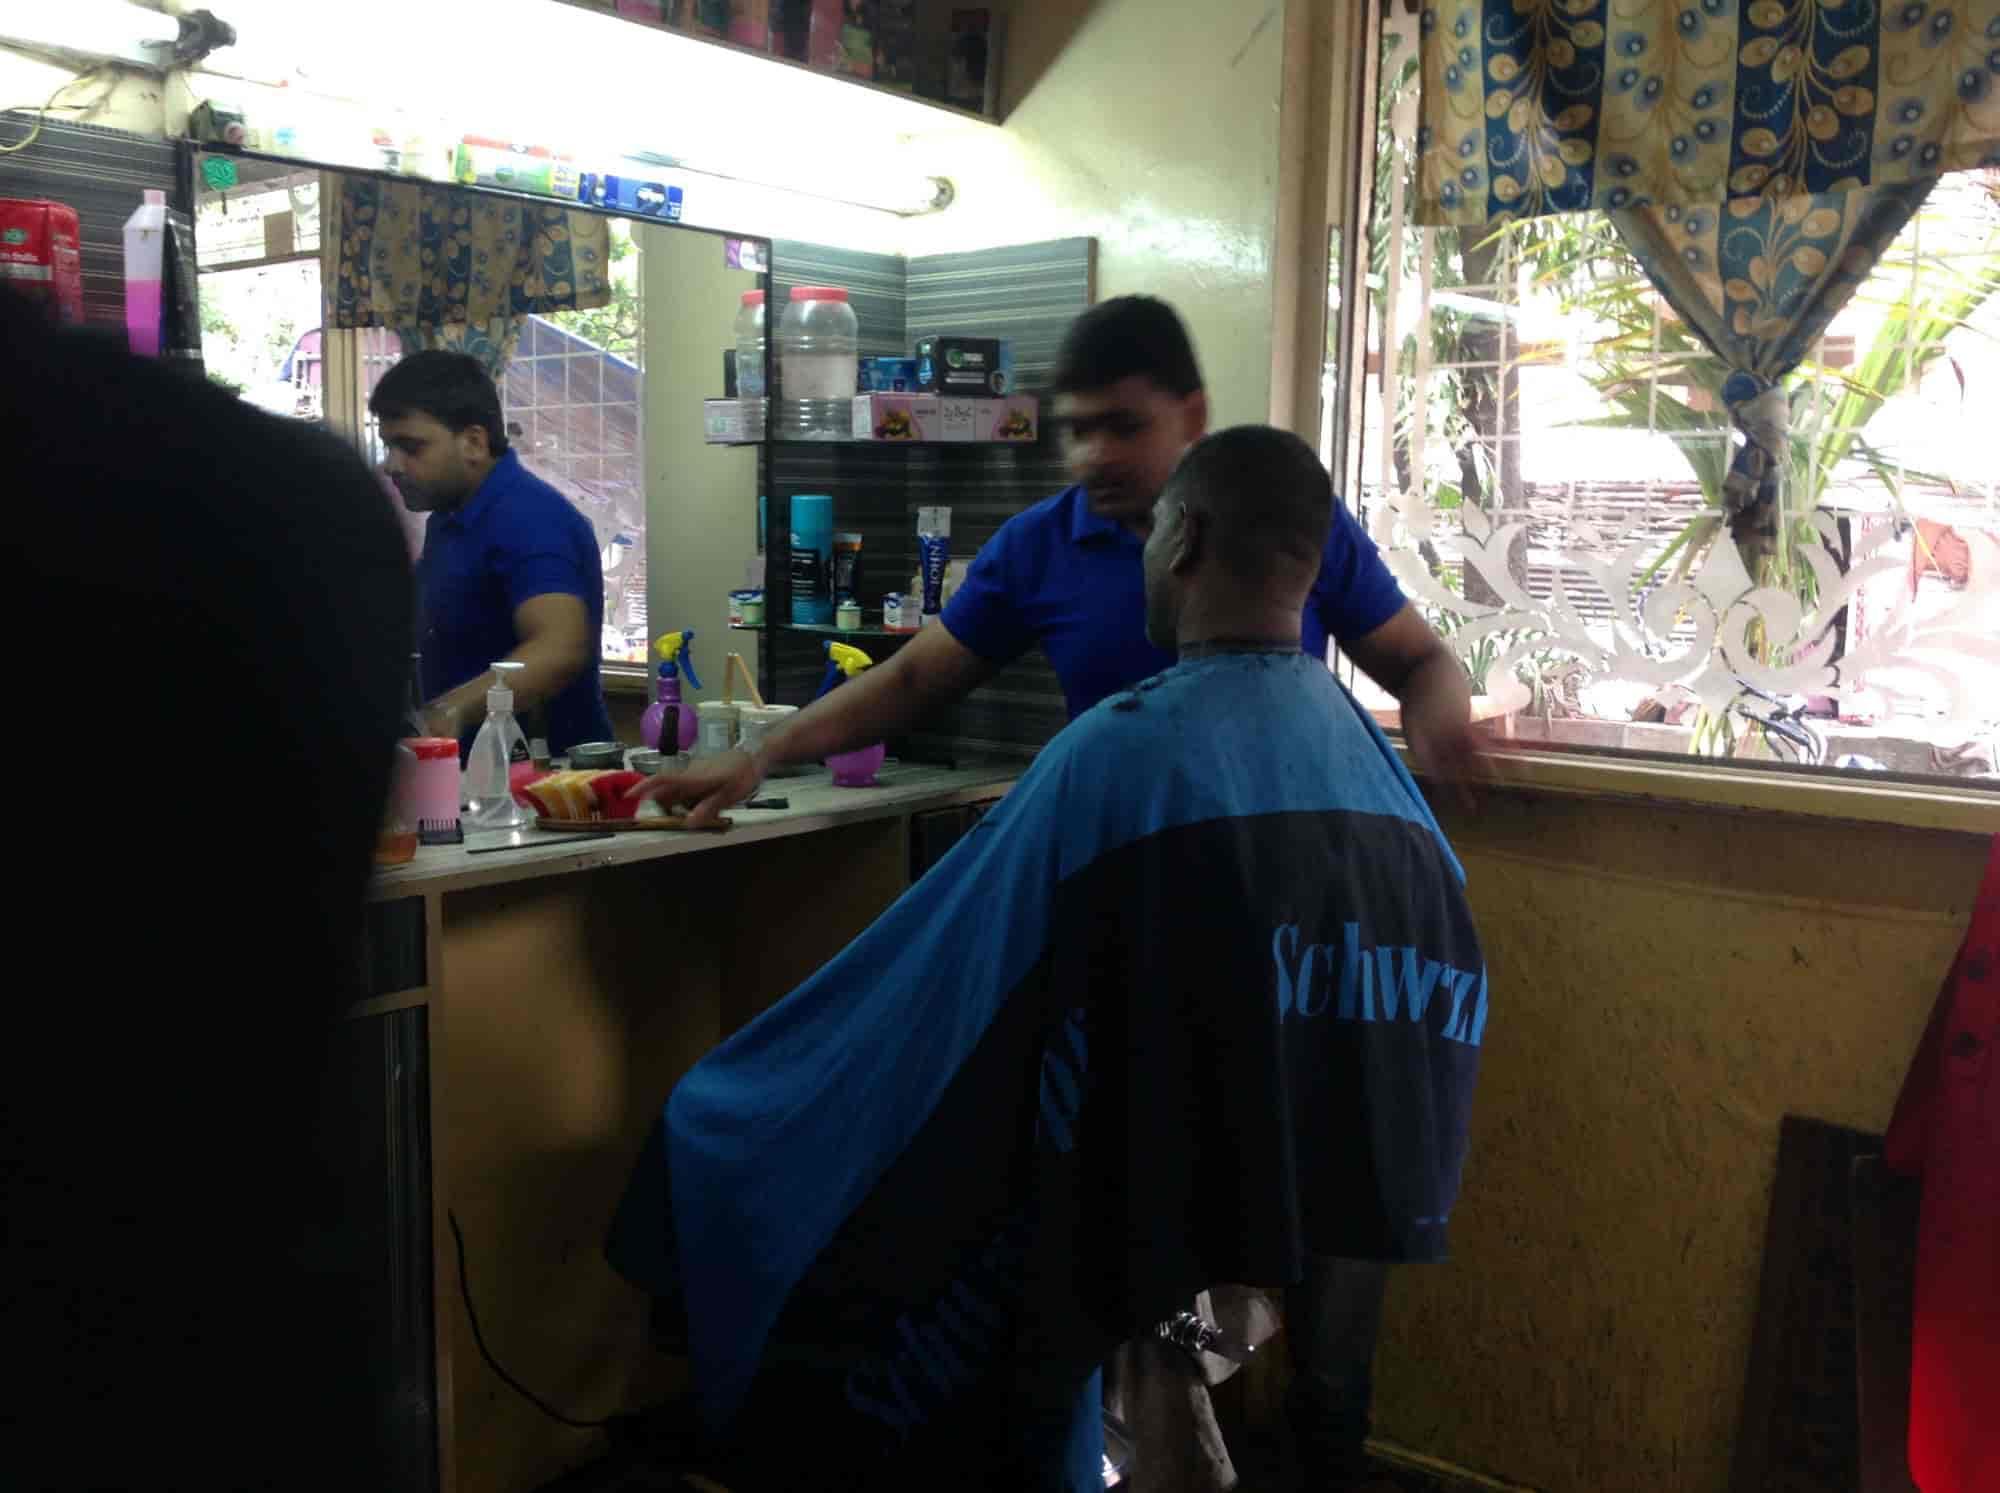 shabina hair cut salon, aundh - salons in pune - justdial